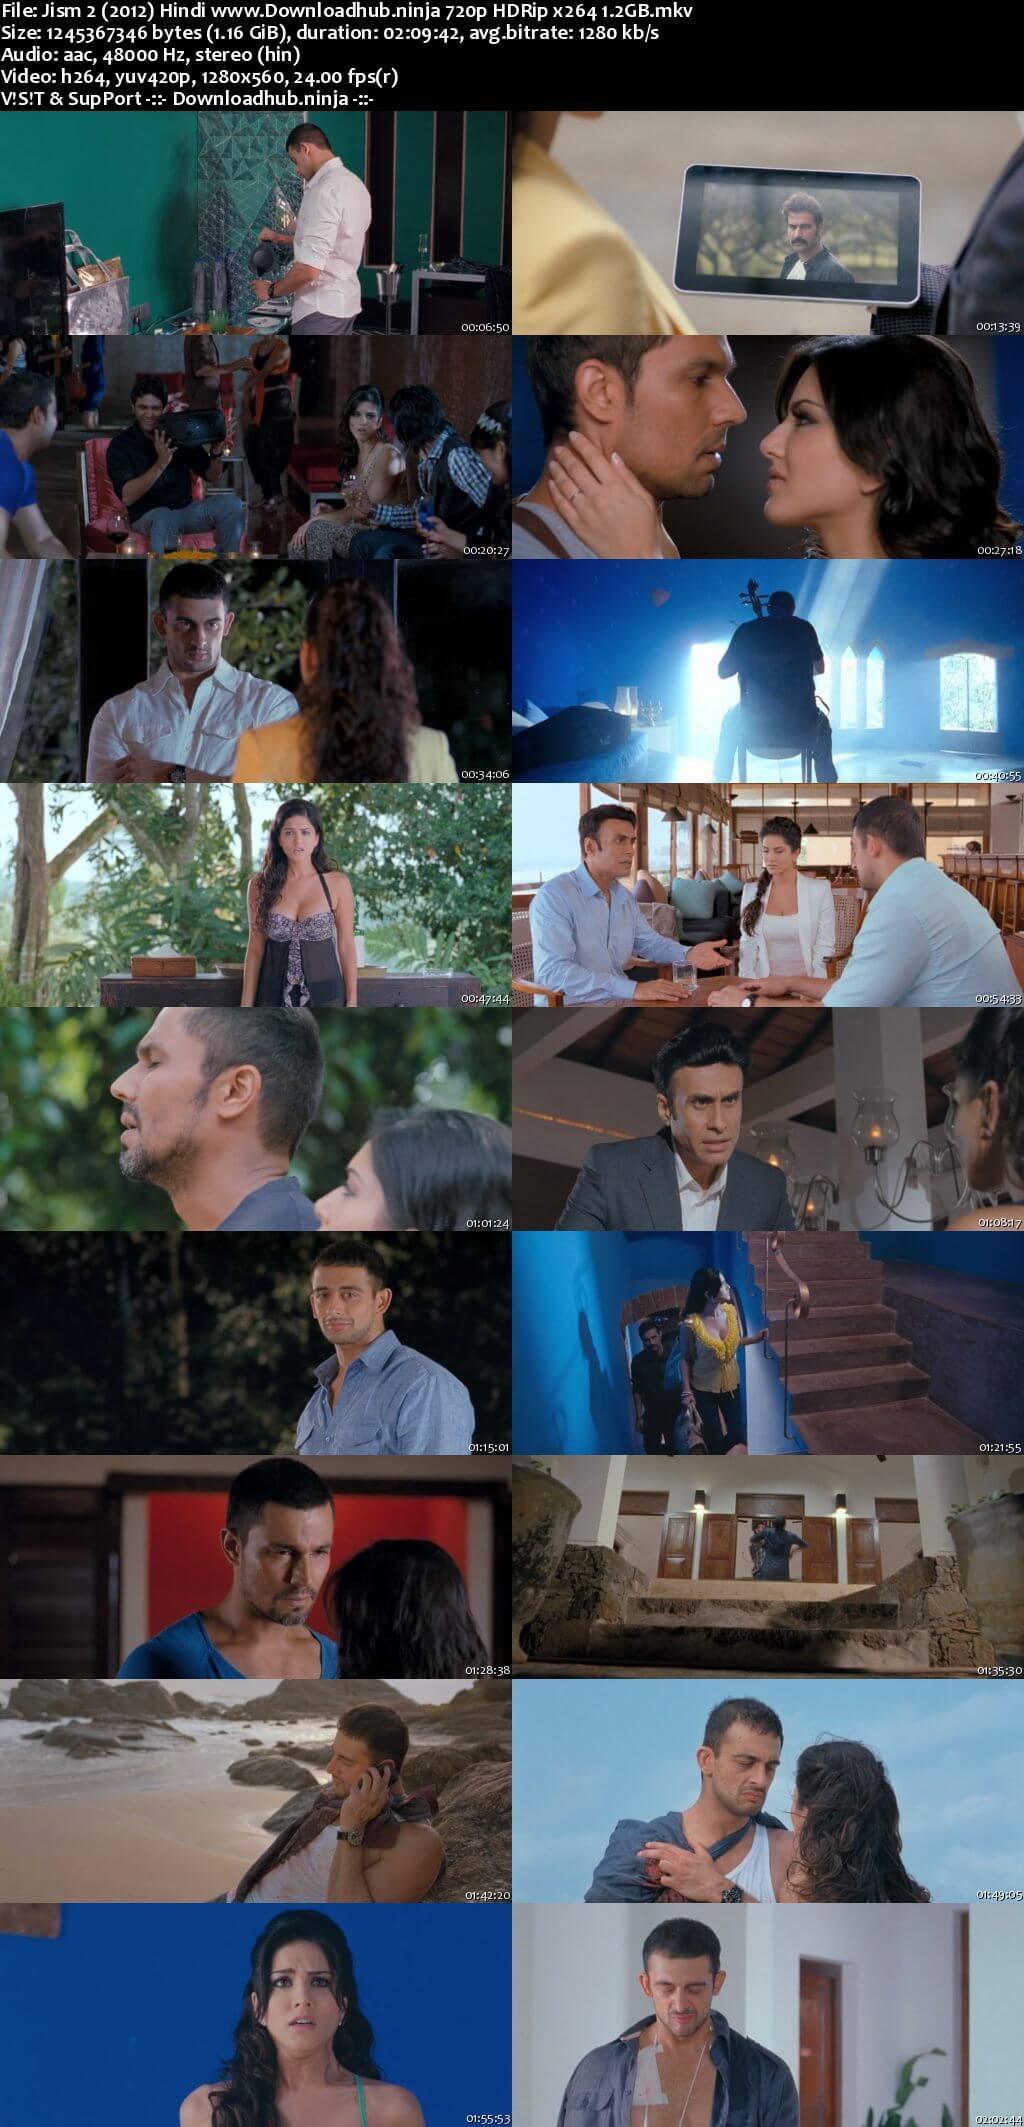 Jism 2 2012 Hindi 720p HDRio x264